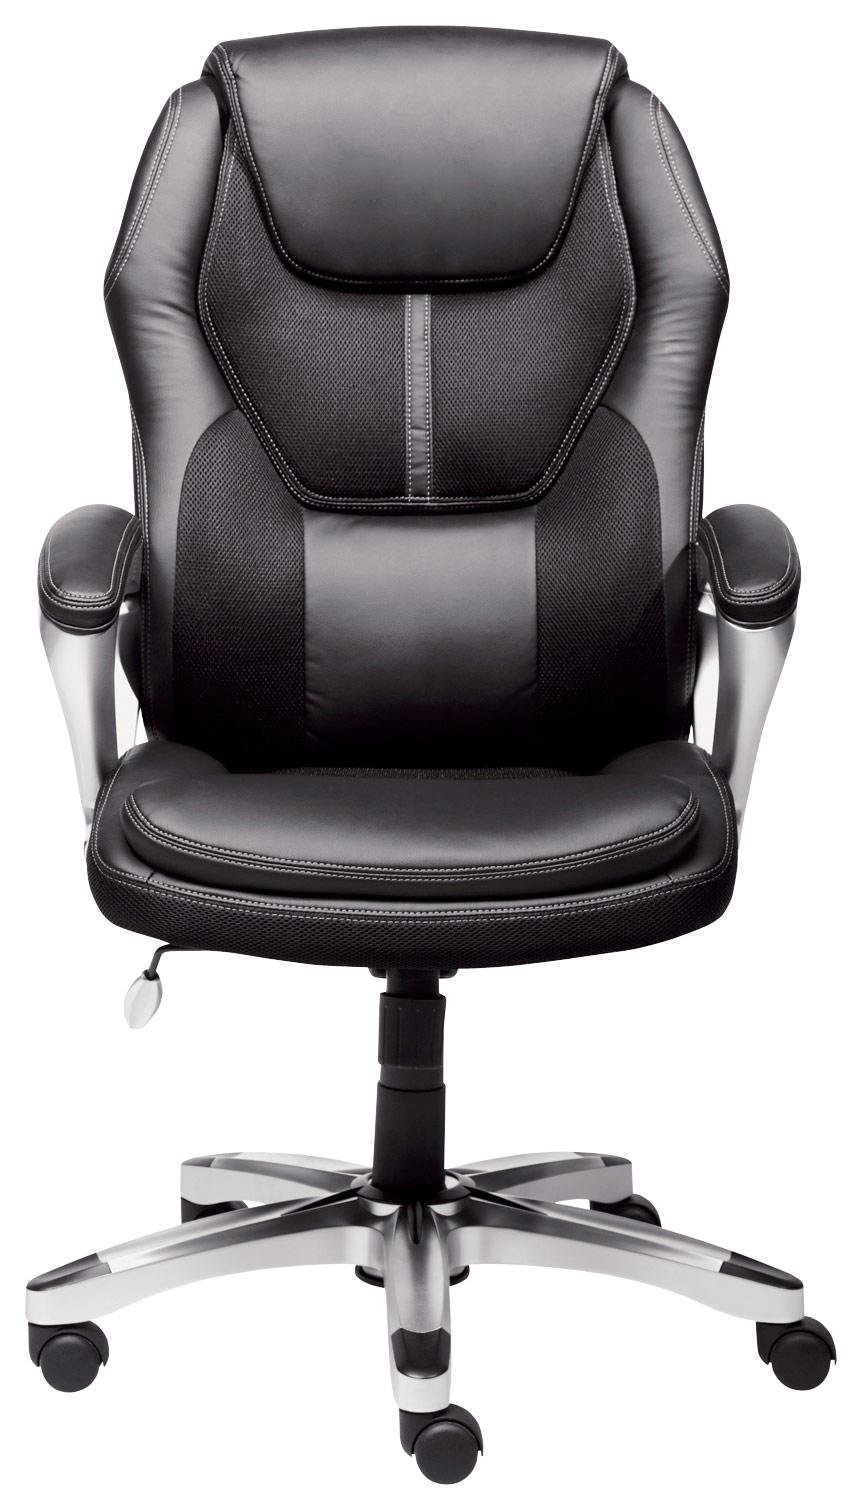 Serta - Executive Office Chair - Black